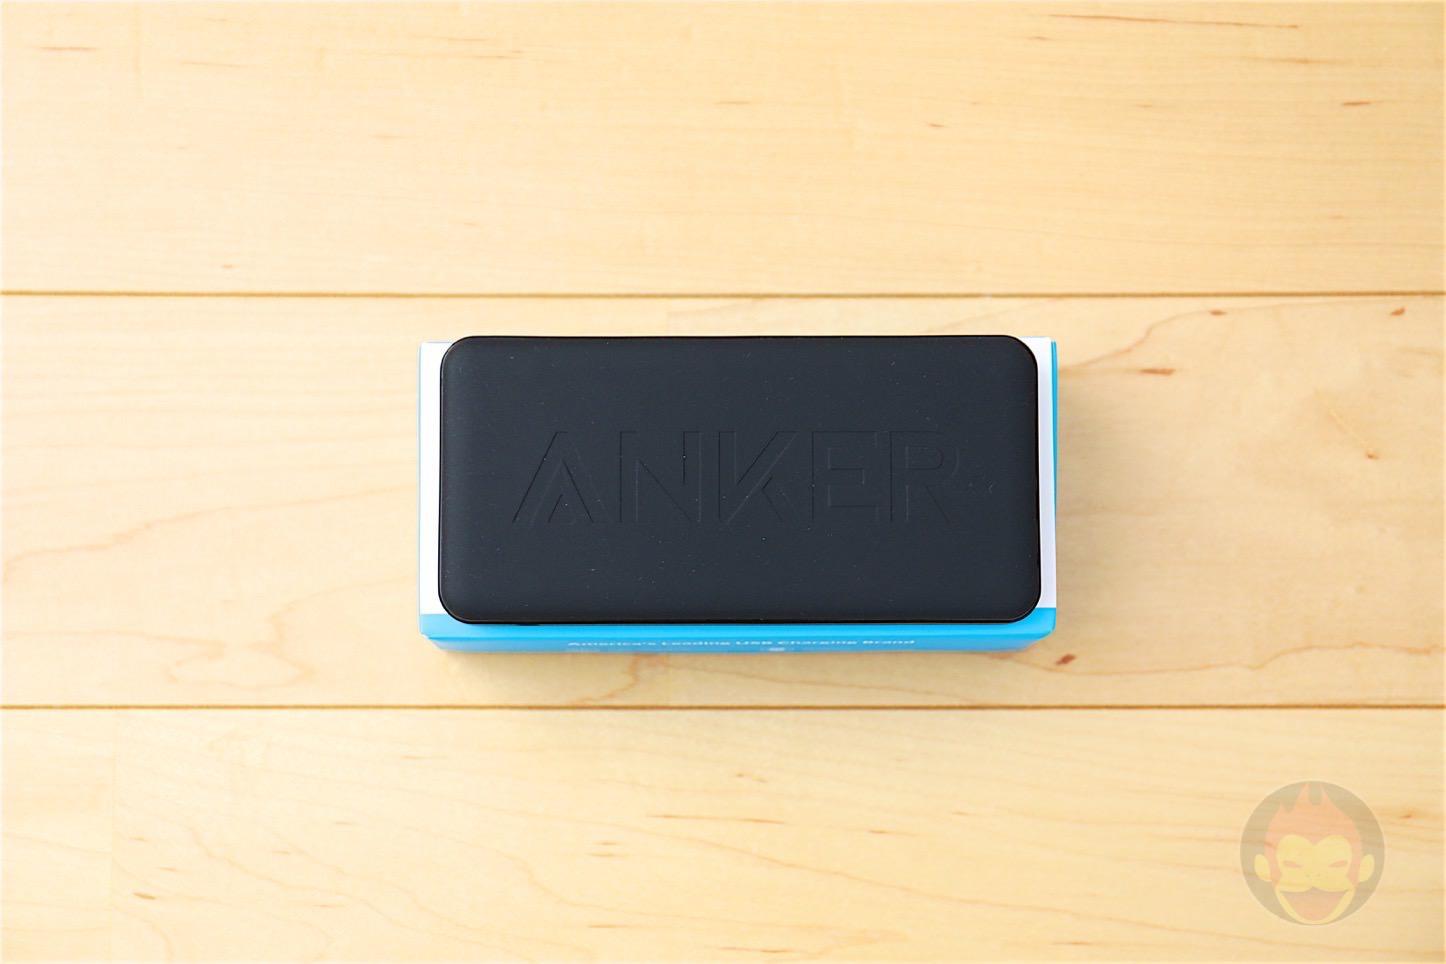 Anker-PowerCore-II-Slim-10000-04.jpg